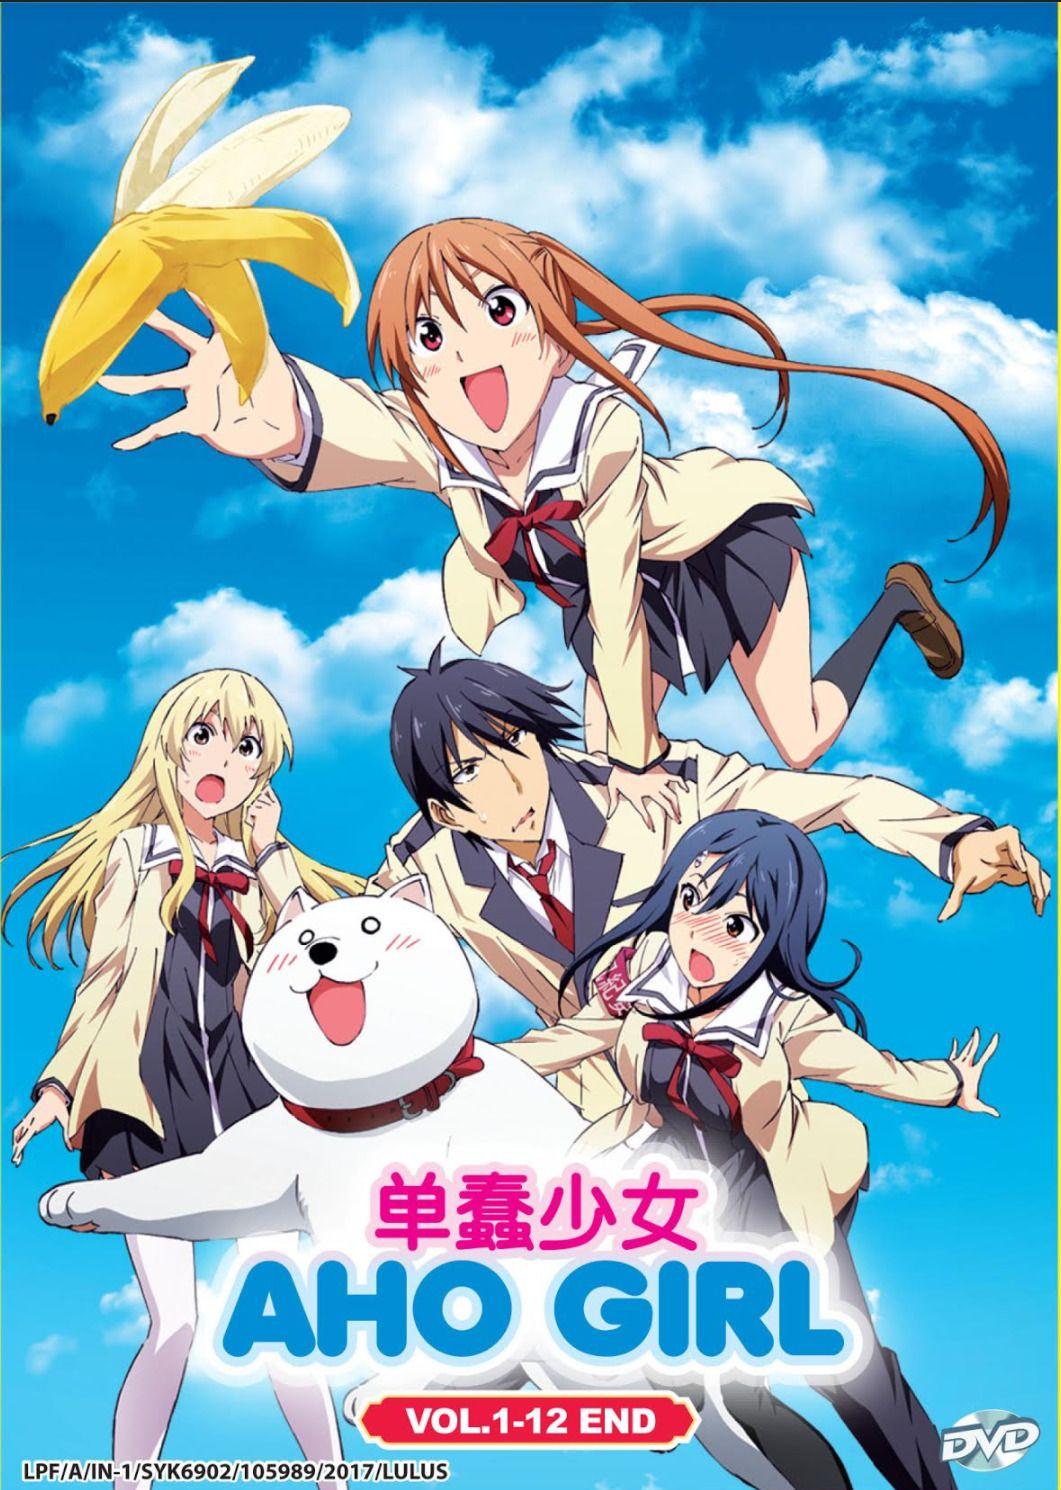 urushihara uncensord 20 Dvd Aho Girl Vol 1-12 End + 1 Free Anime